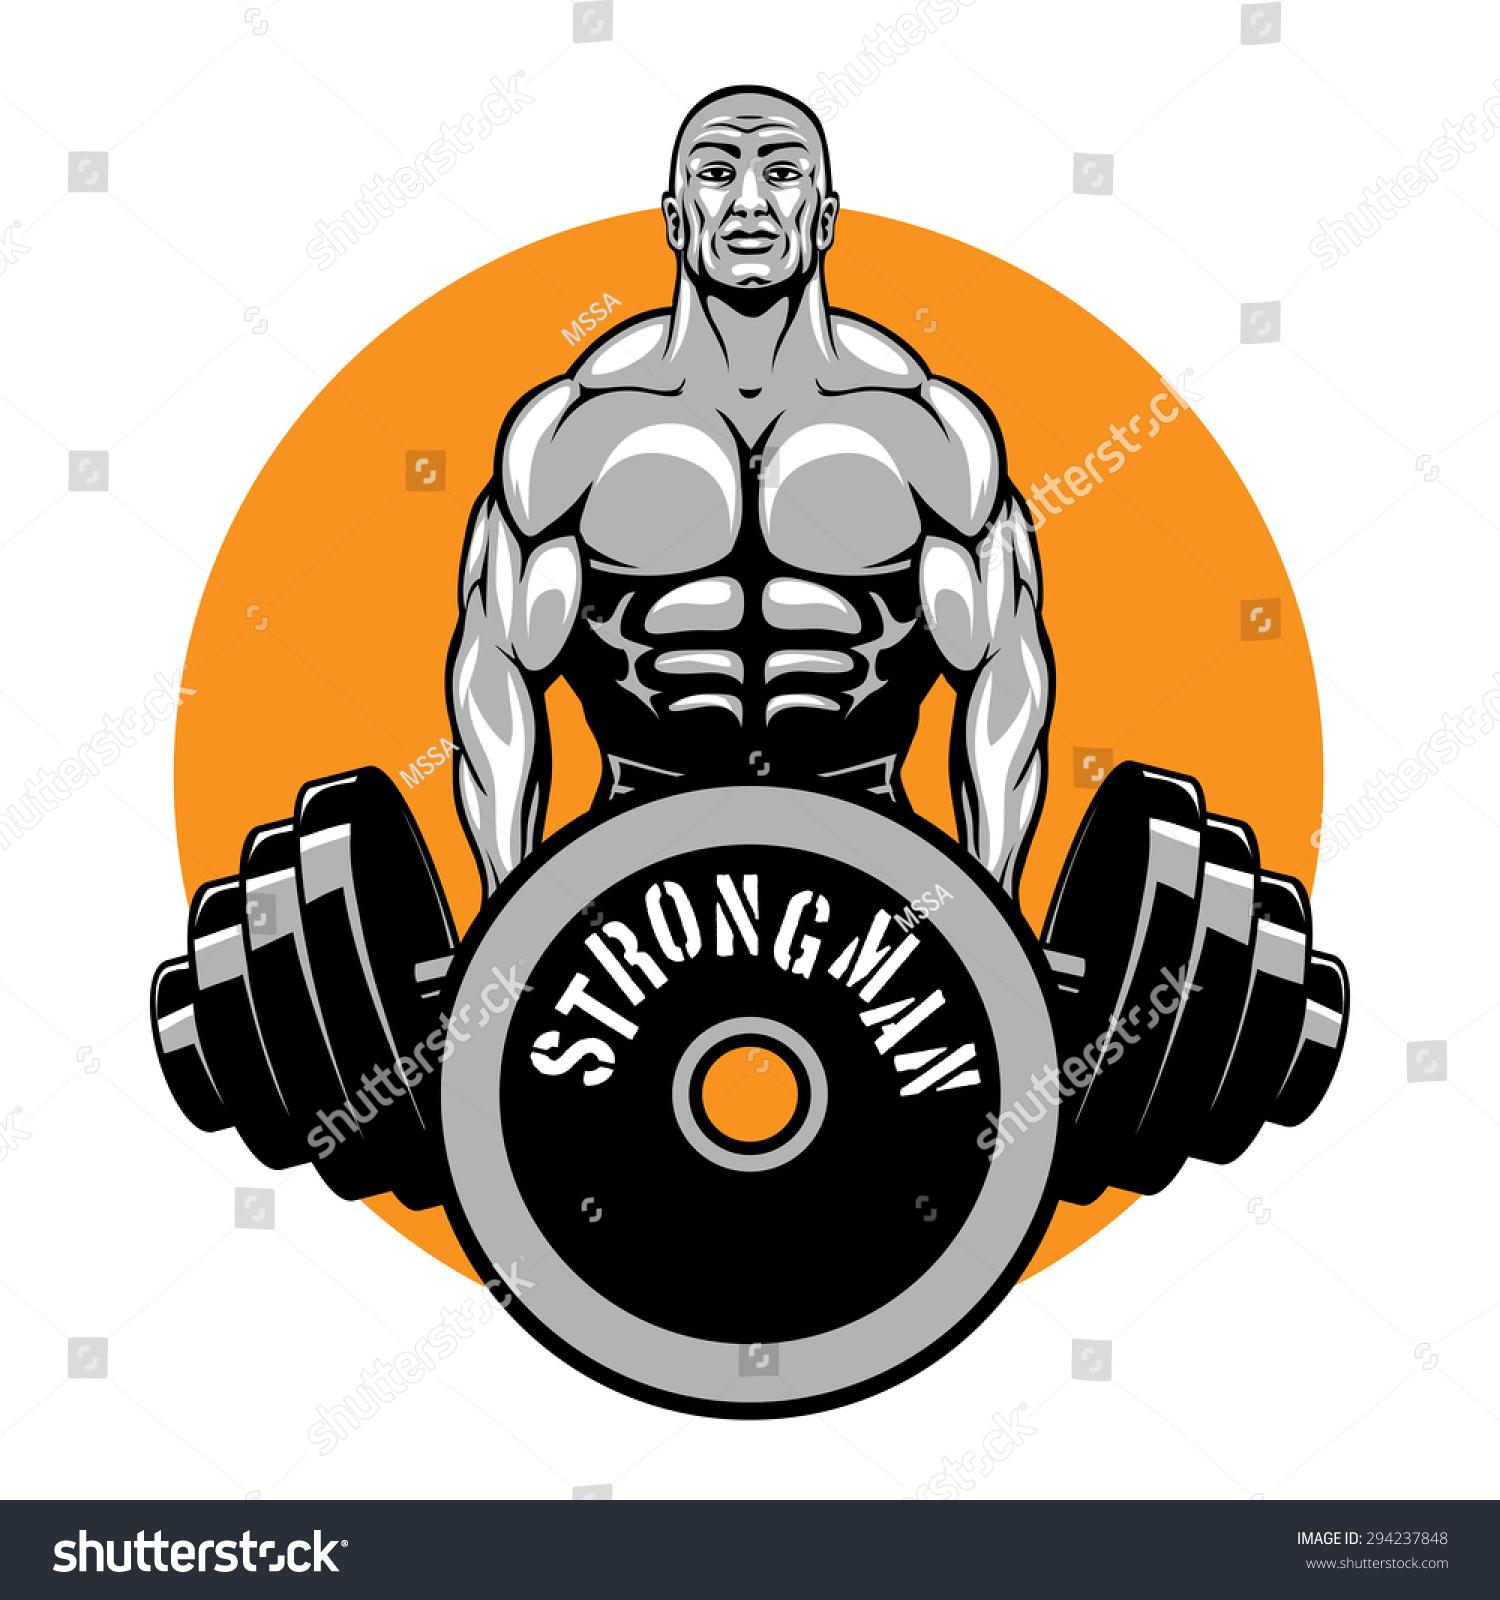 Shirt design equipment - T Shirt Design For Bodybuilders And Fitness Club Logo Or Emblem Sport Power